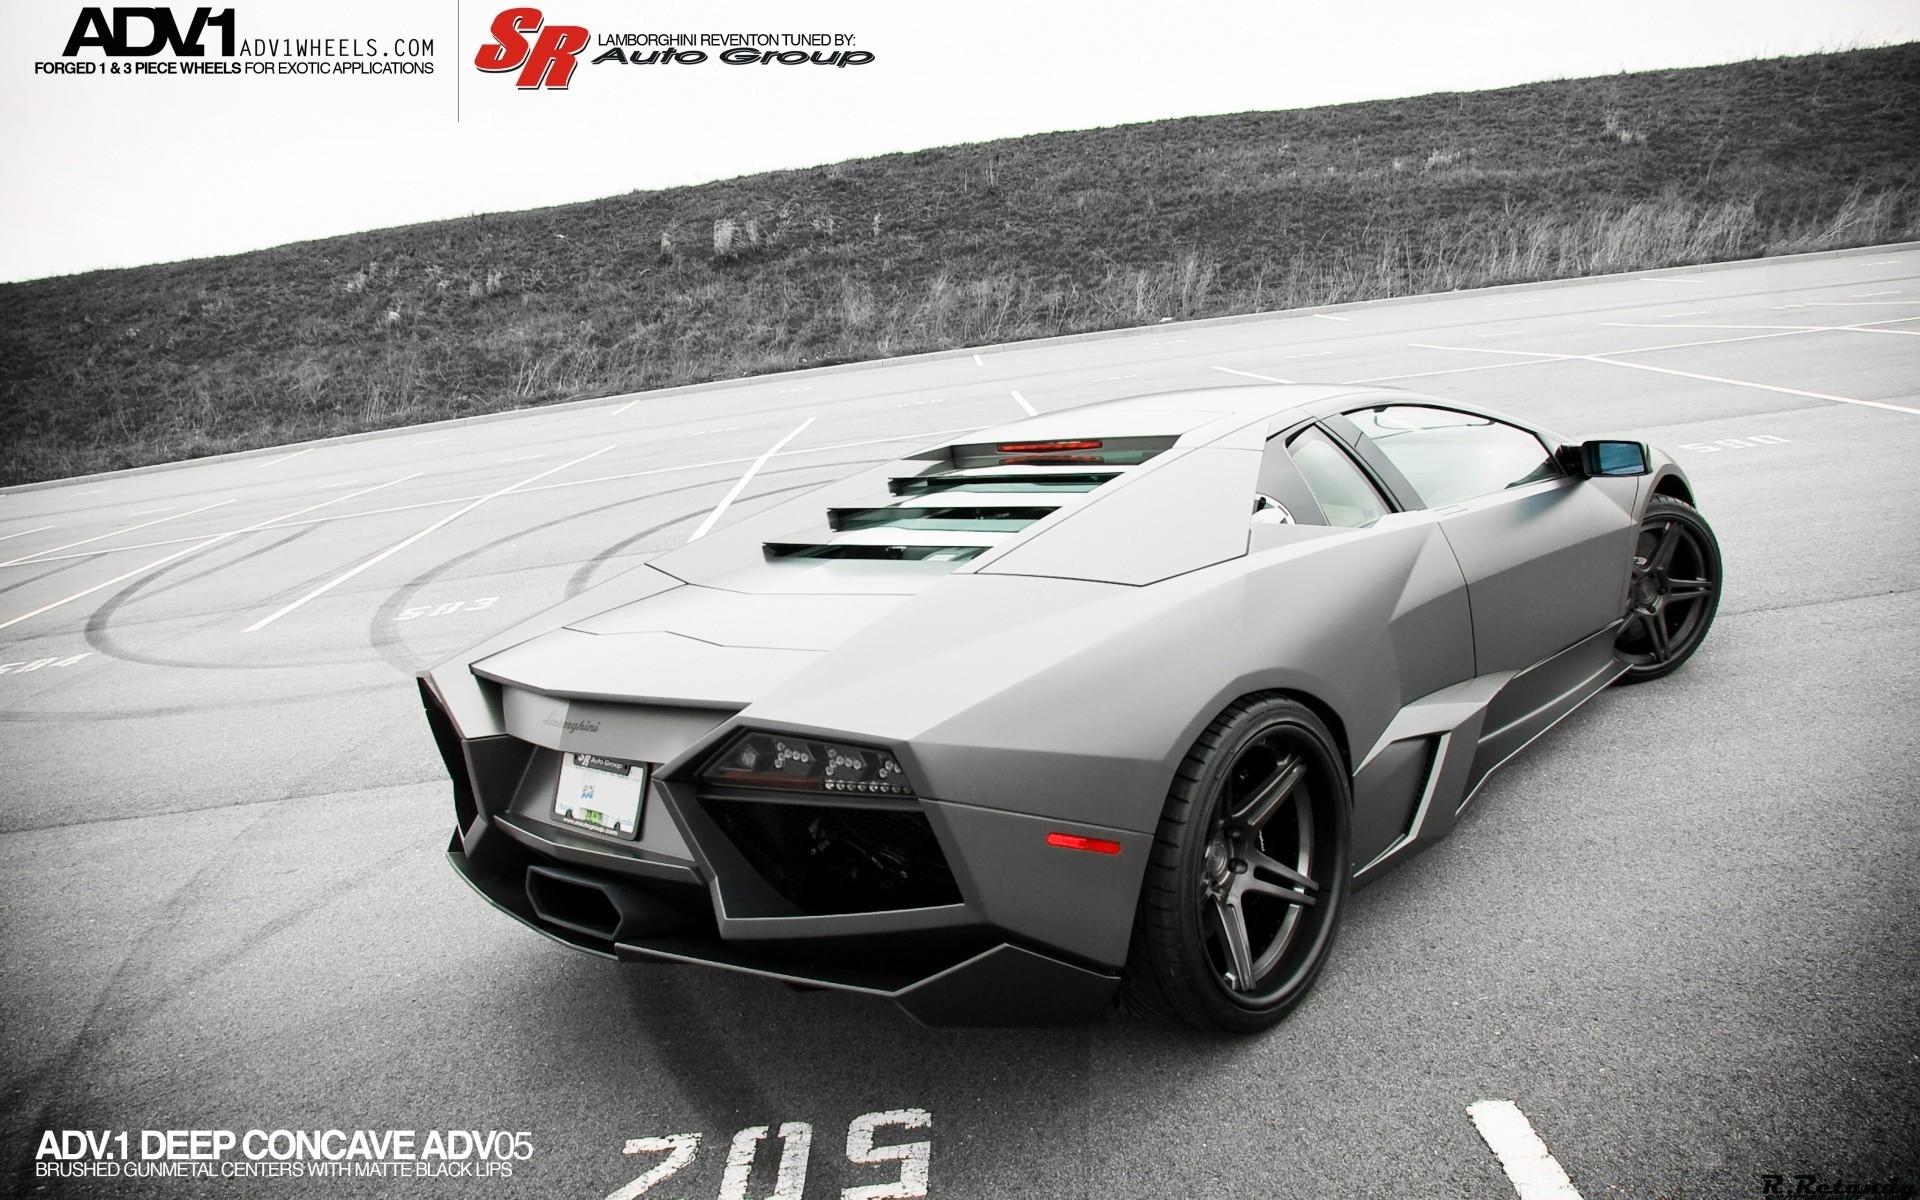 Adv 1 Lamborghini Reventon Android Wallpapers For Free